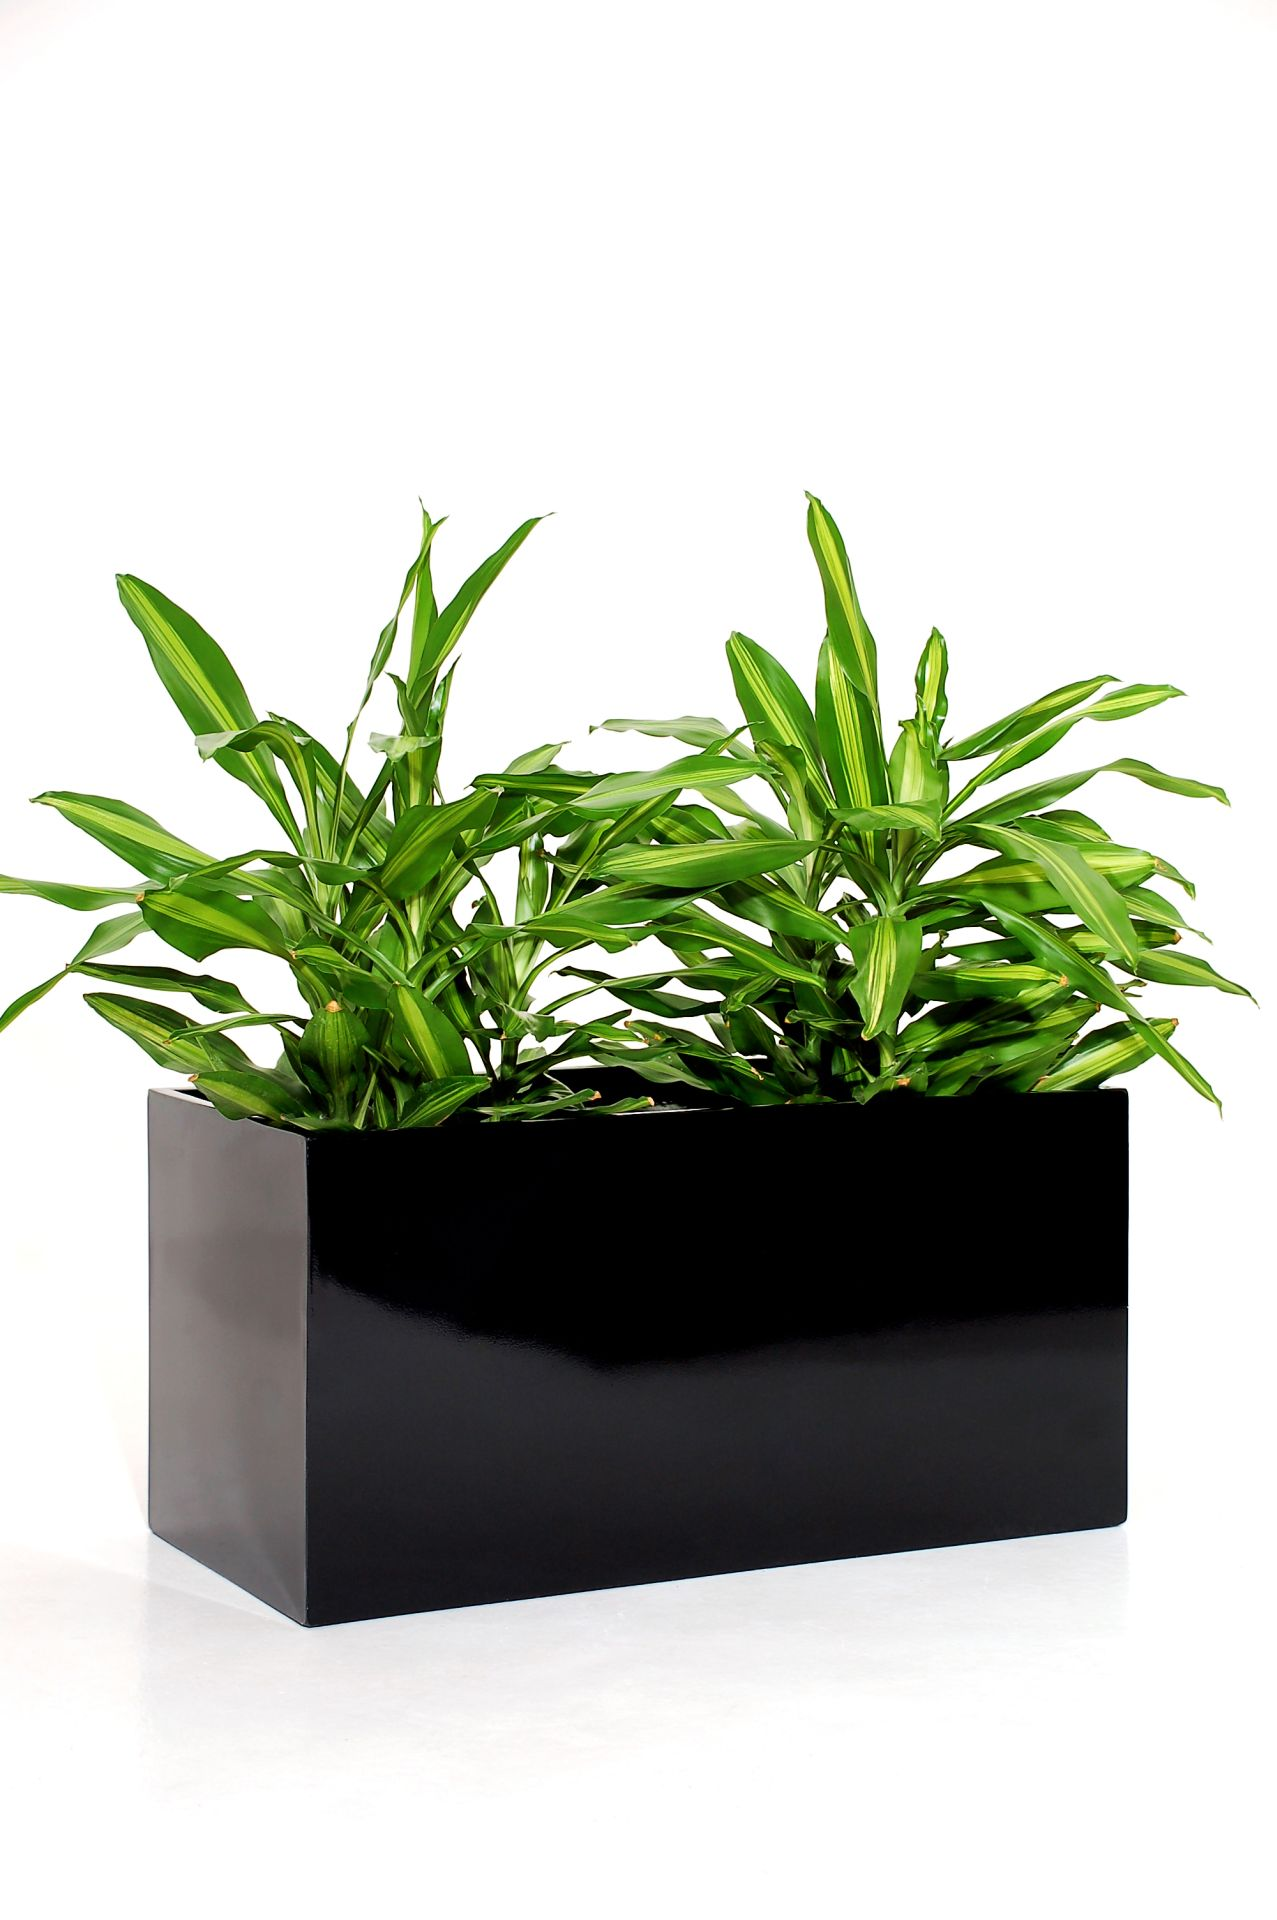 Blumenk bel pflanzk bel pflanzgef e pflanztrog fiberglas for Fiberglas eigenschaften